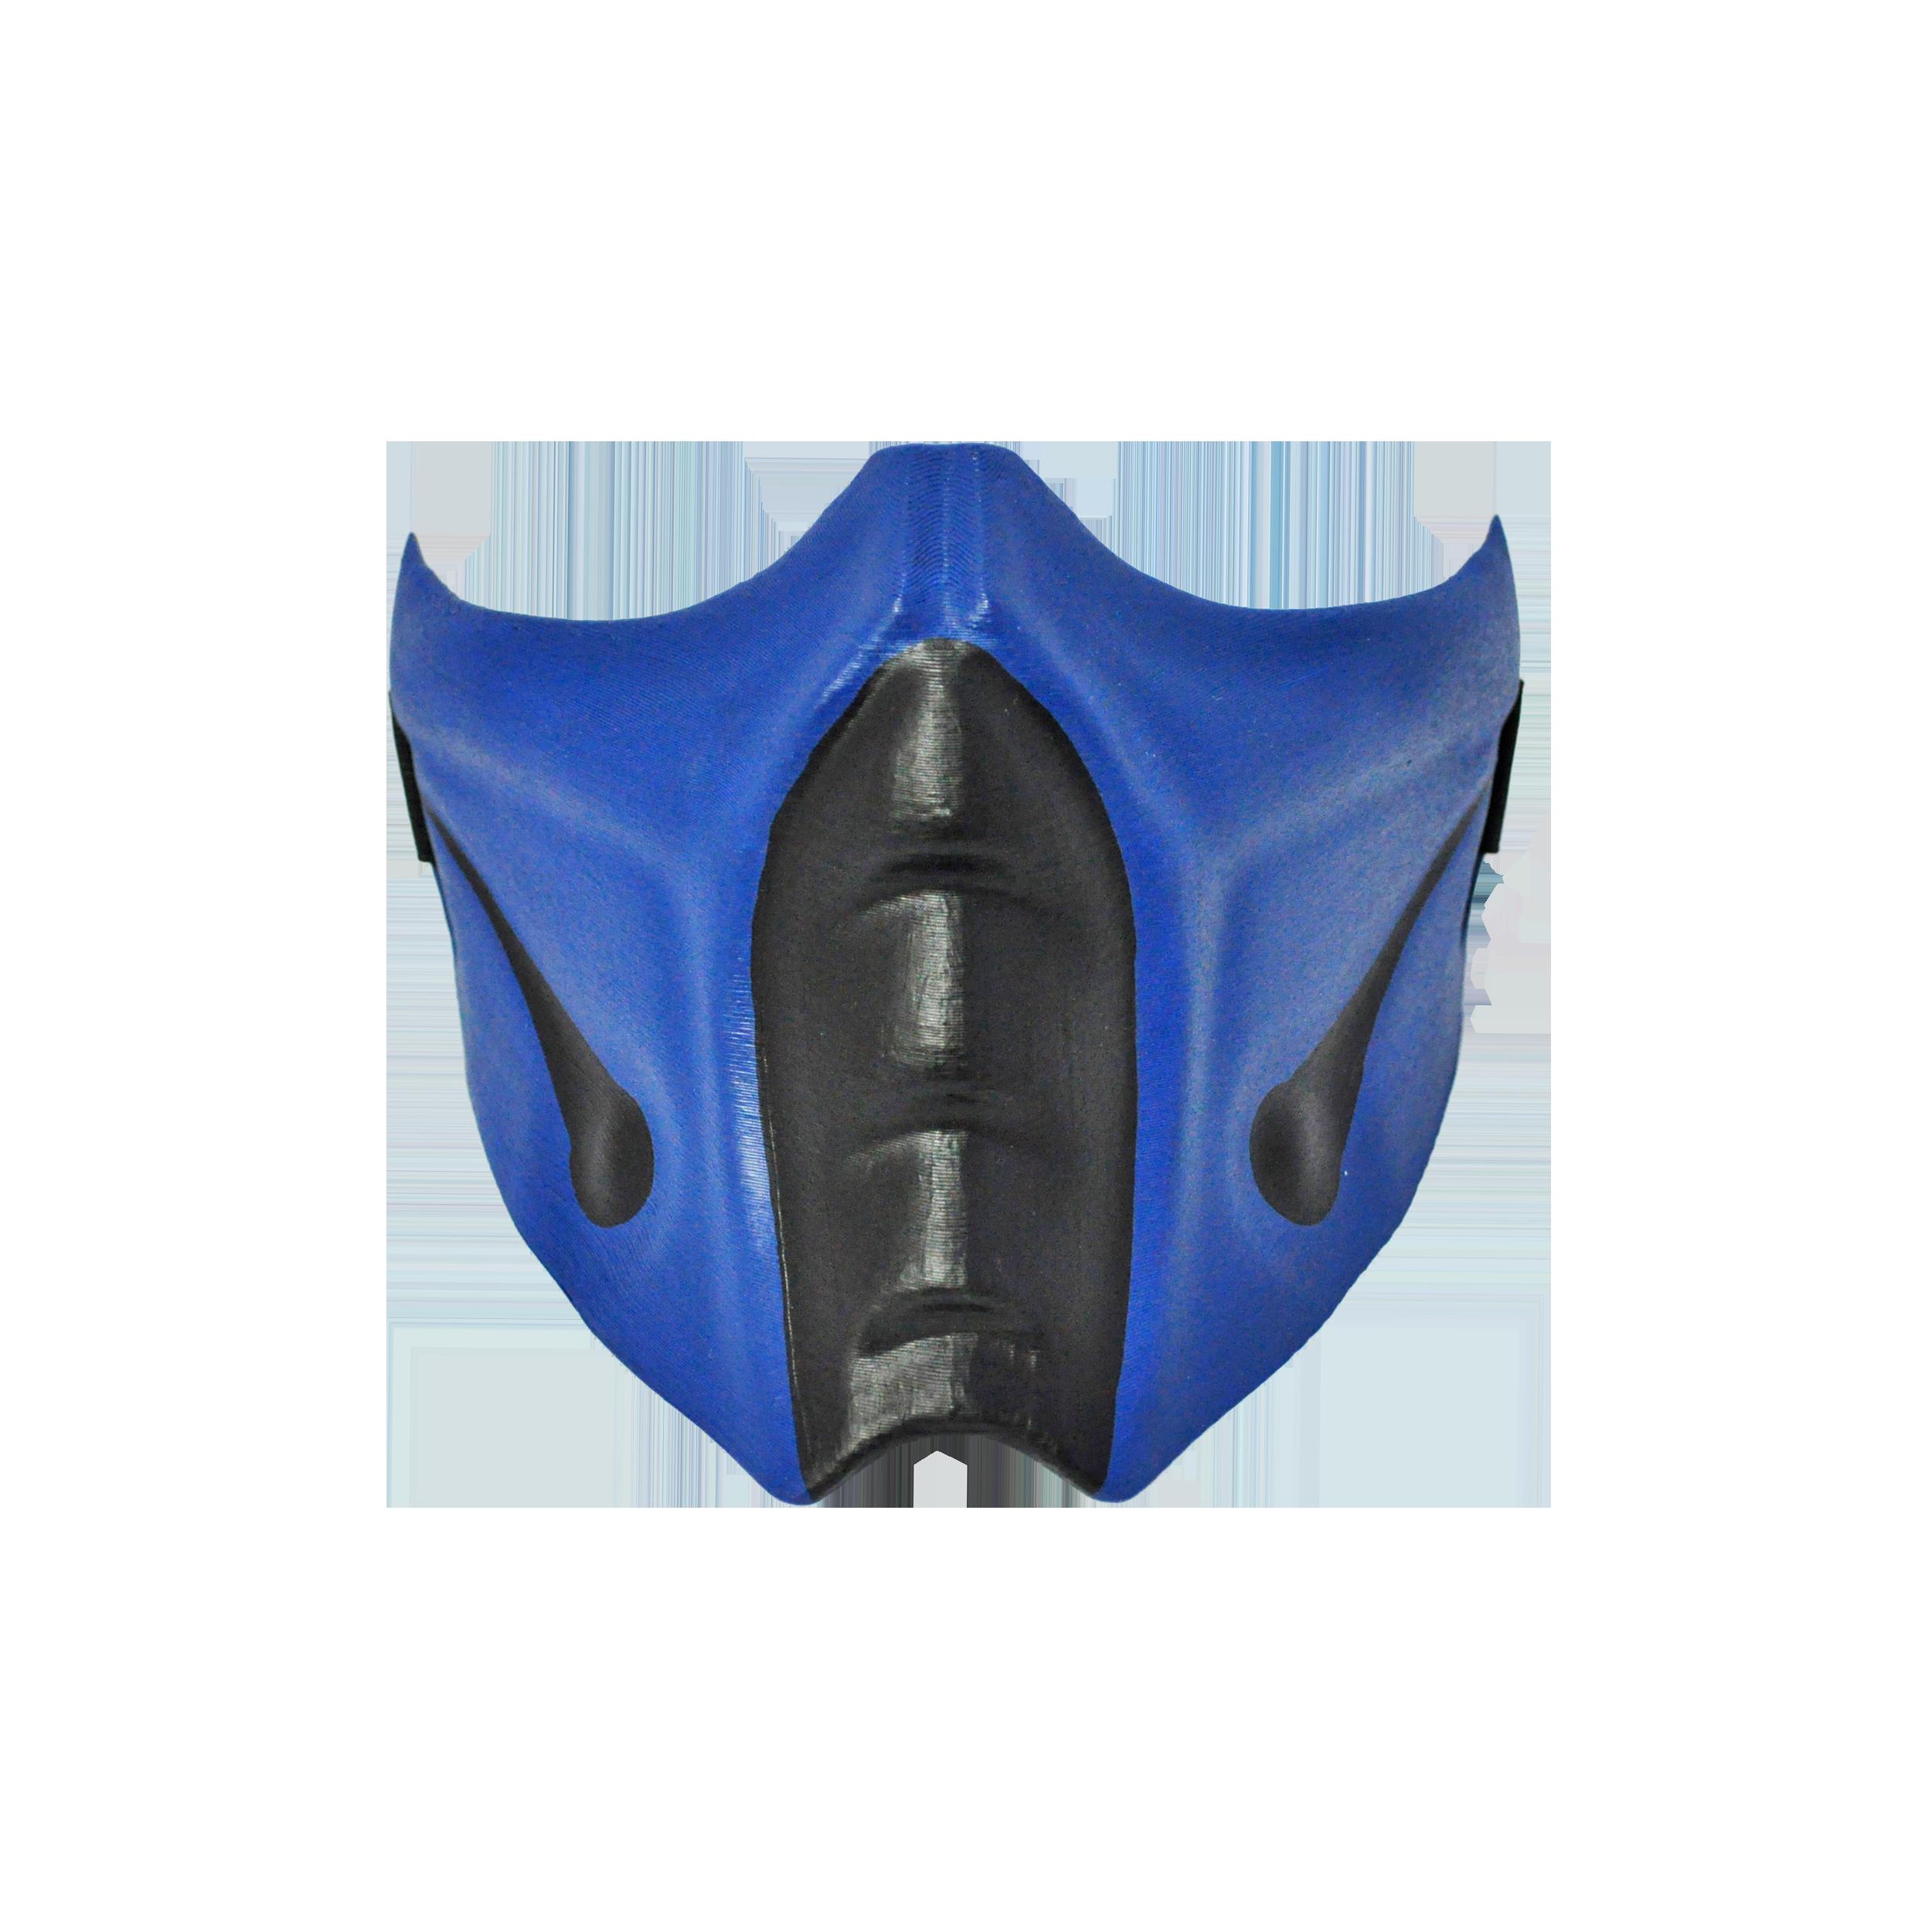 Sub Zero Mask From Mk Cosplay Or Airsoft Mask Mortal Kombat